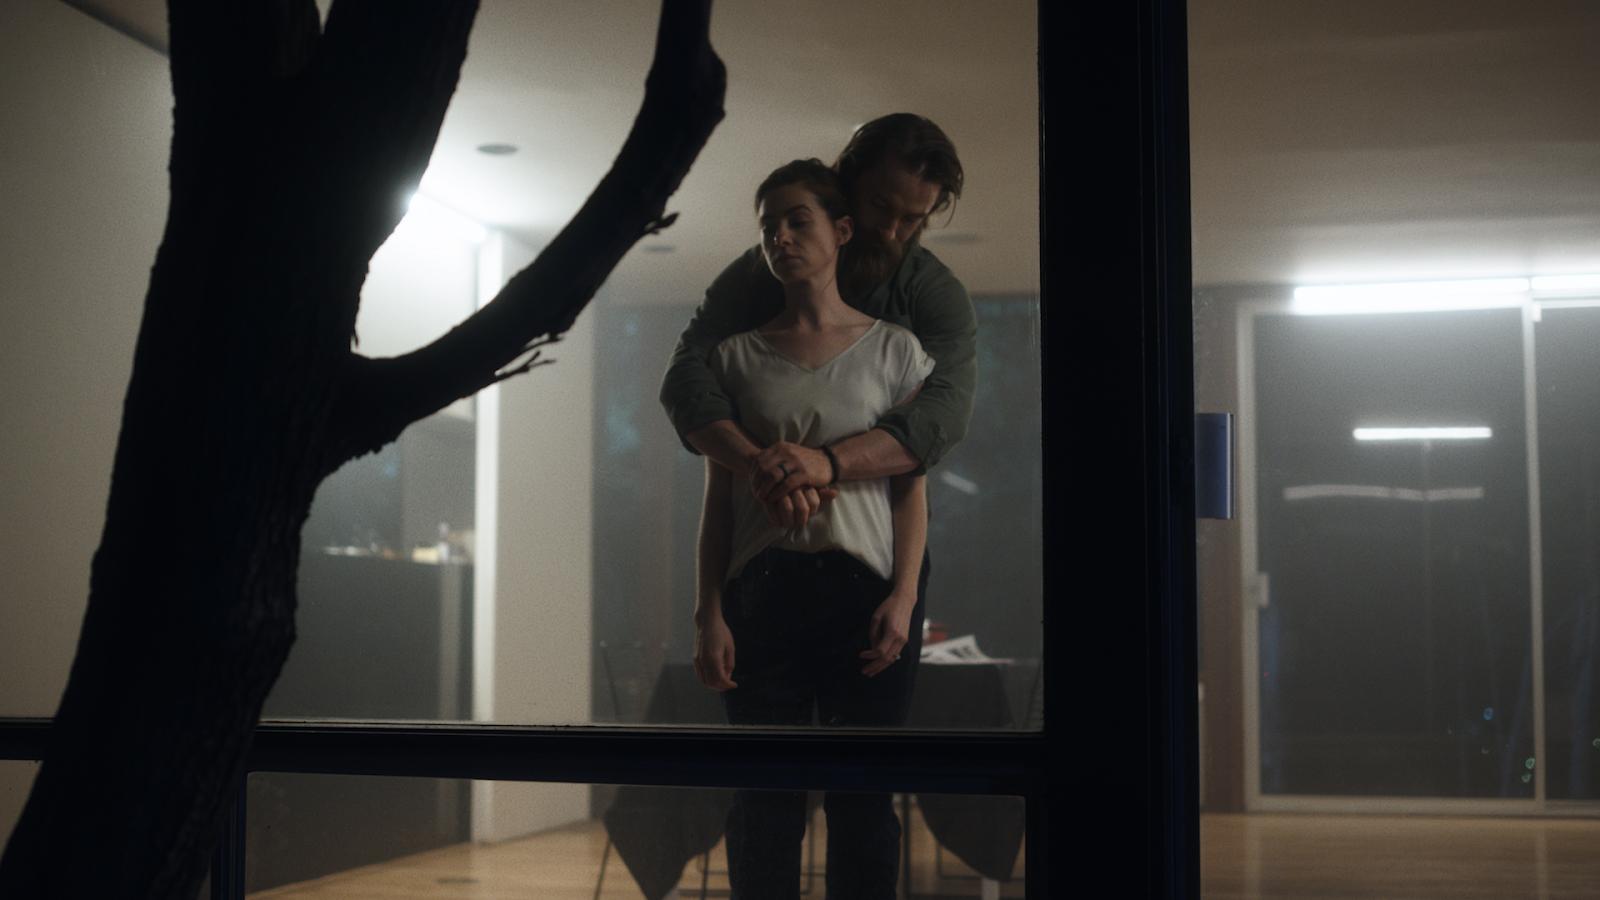 Thriller Short 'GRIEF' Premieres on Digital Horror Network ALTER